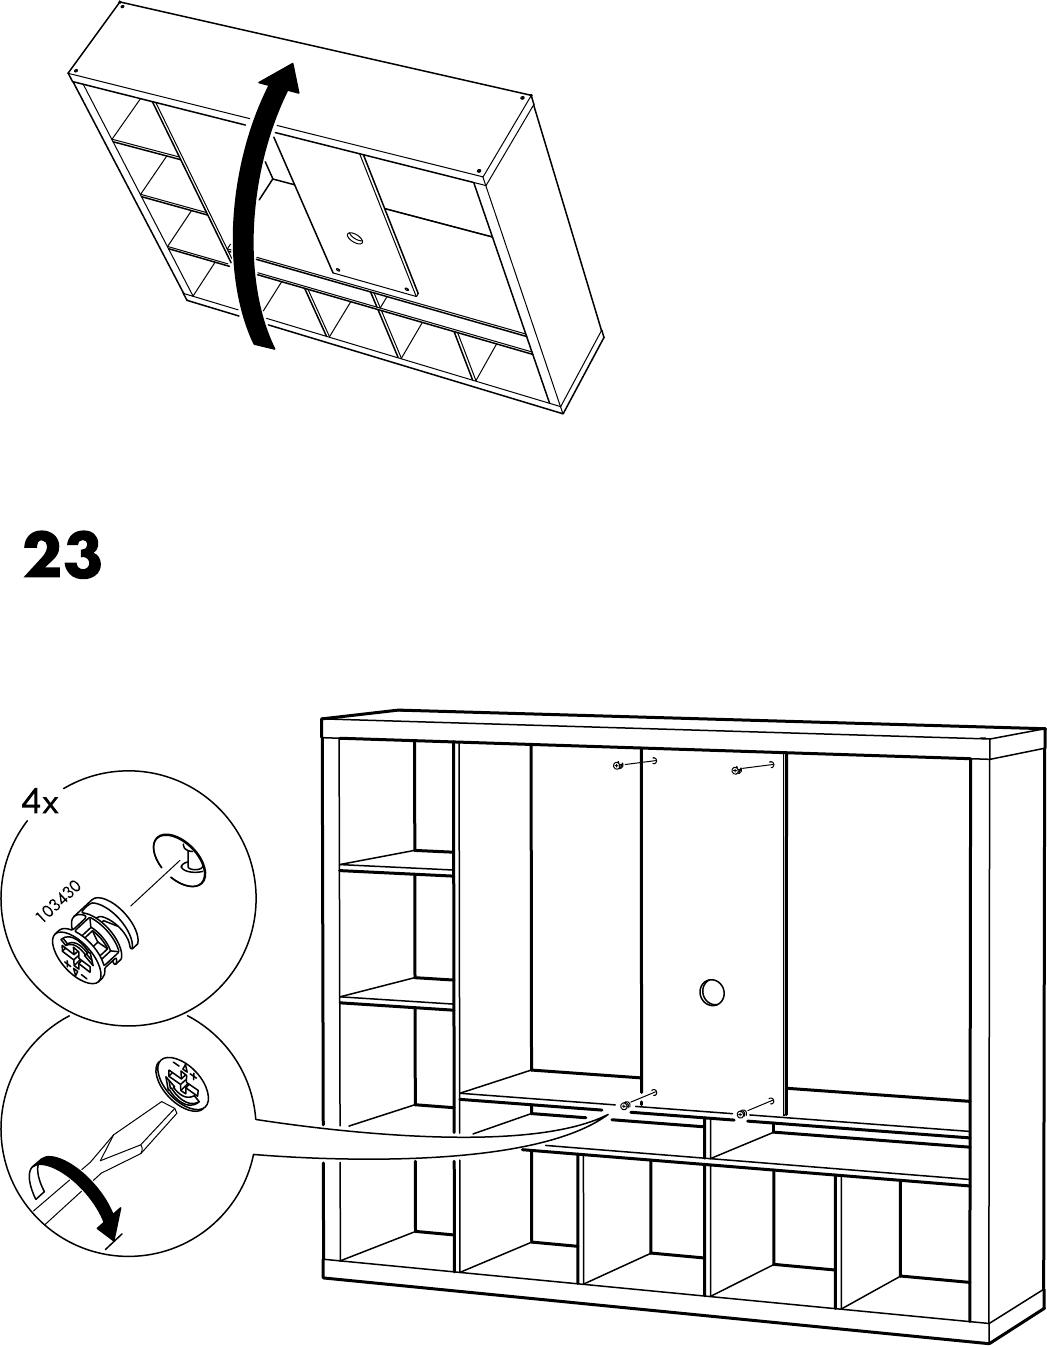 Expedit Tv Kast.Handleiding Ikea Expedit Tv Kast Pagina 22 Van 32 Alle Talen